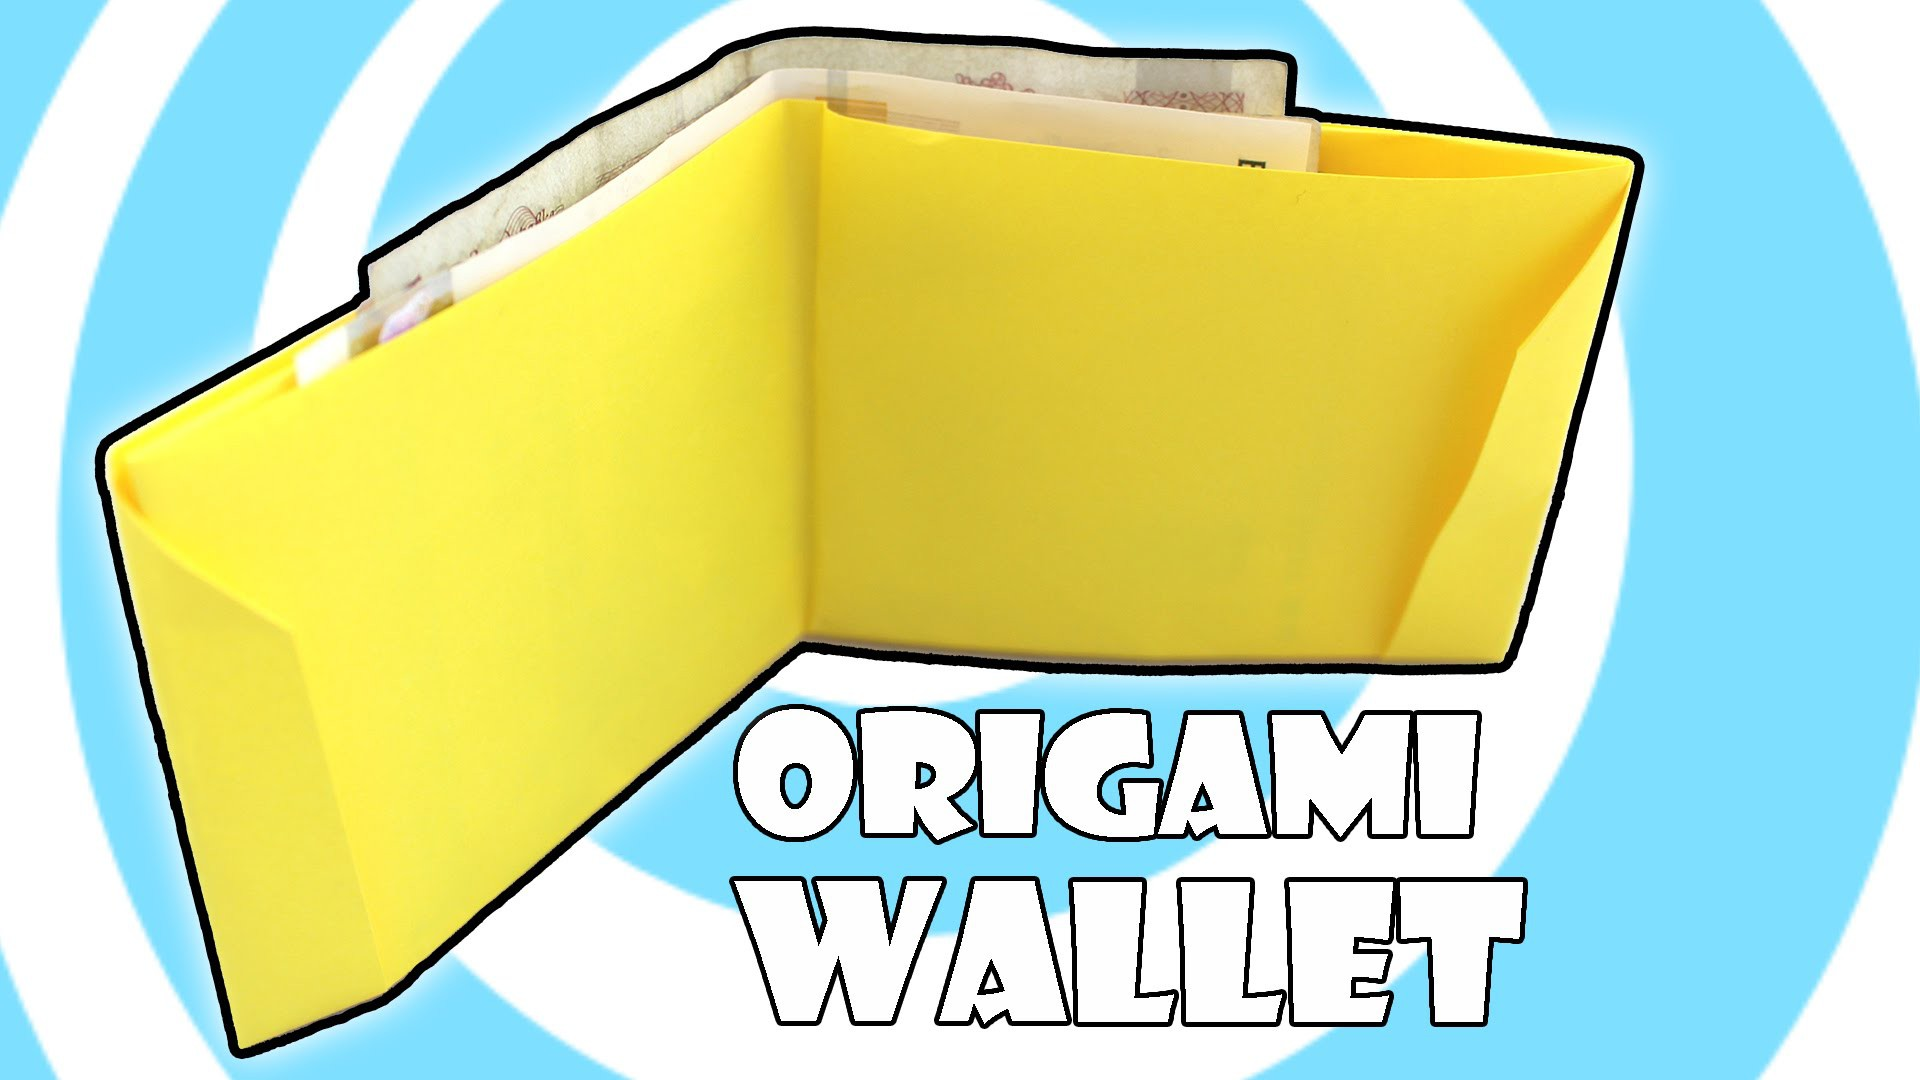 DIY: Printing Paper Origami Wallet Instructions (Laura Kruskal)